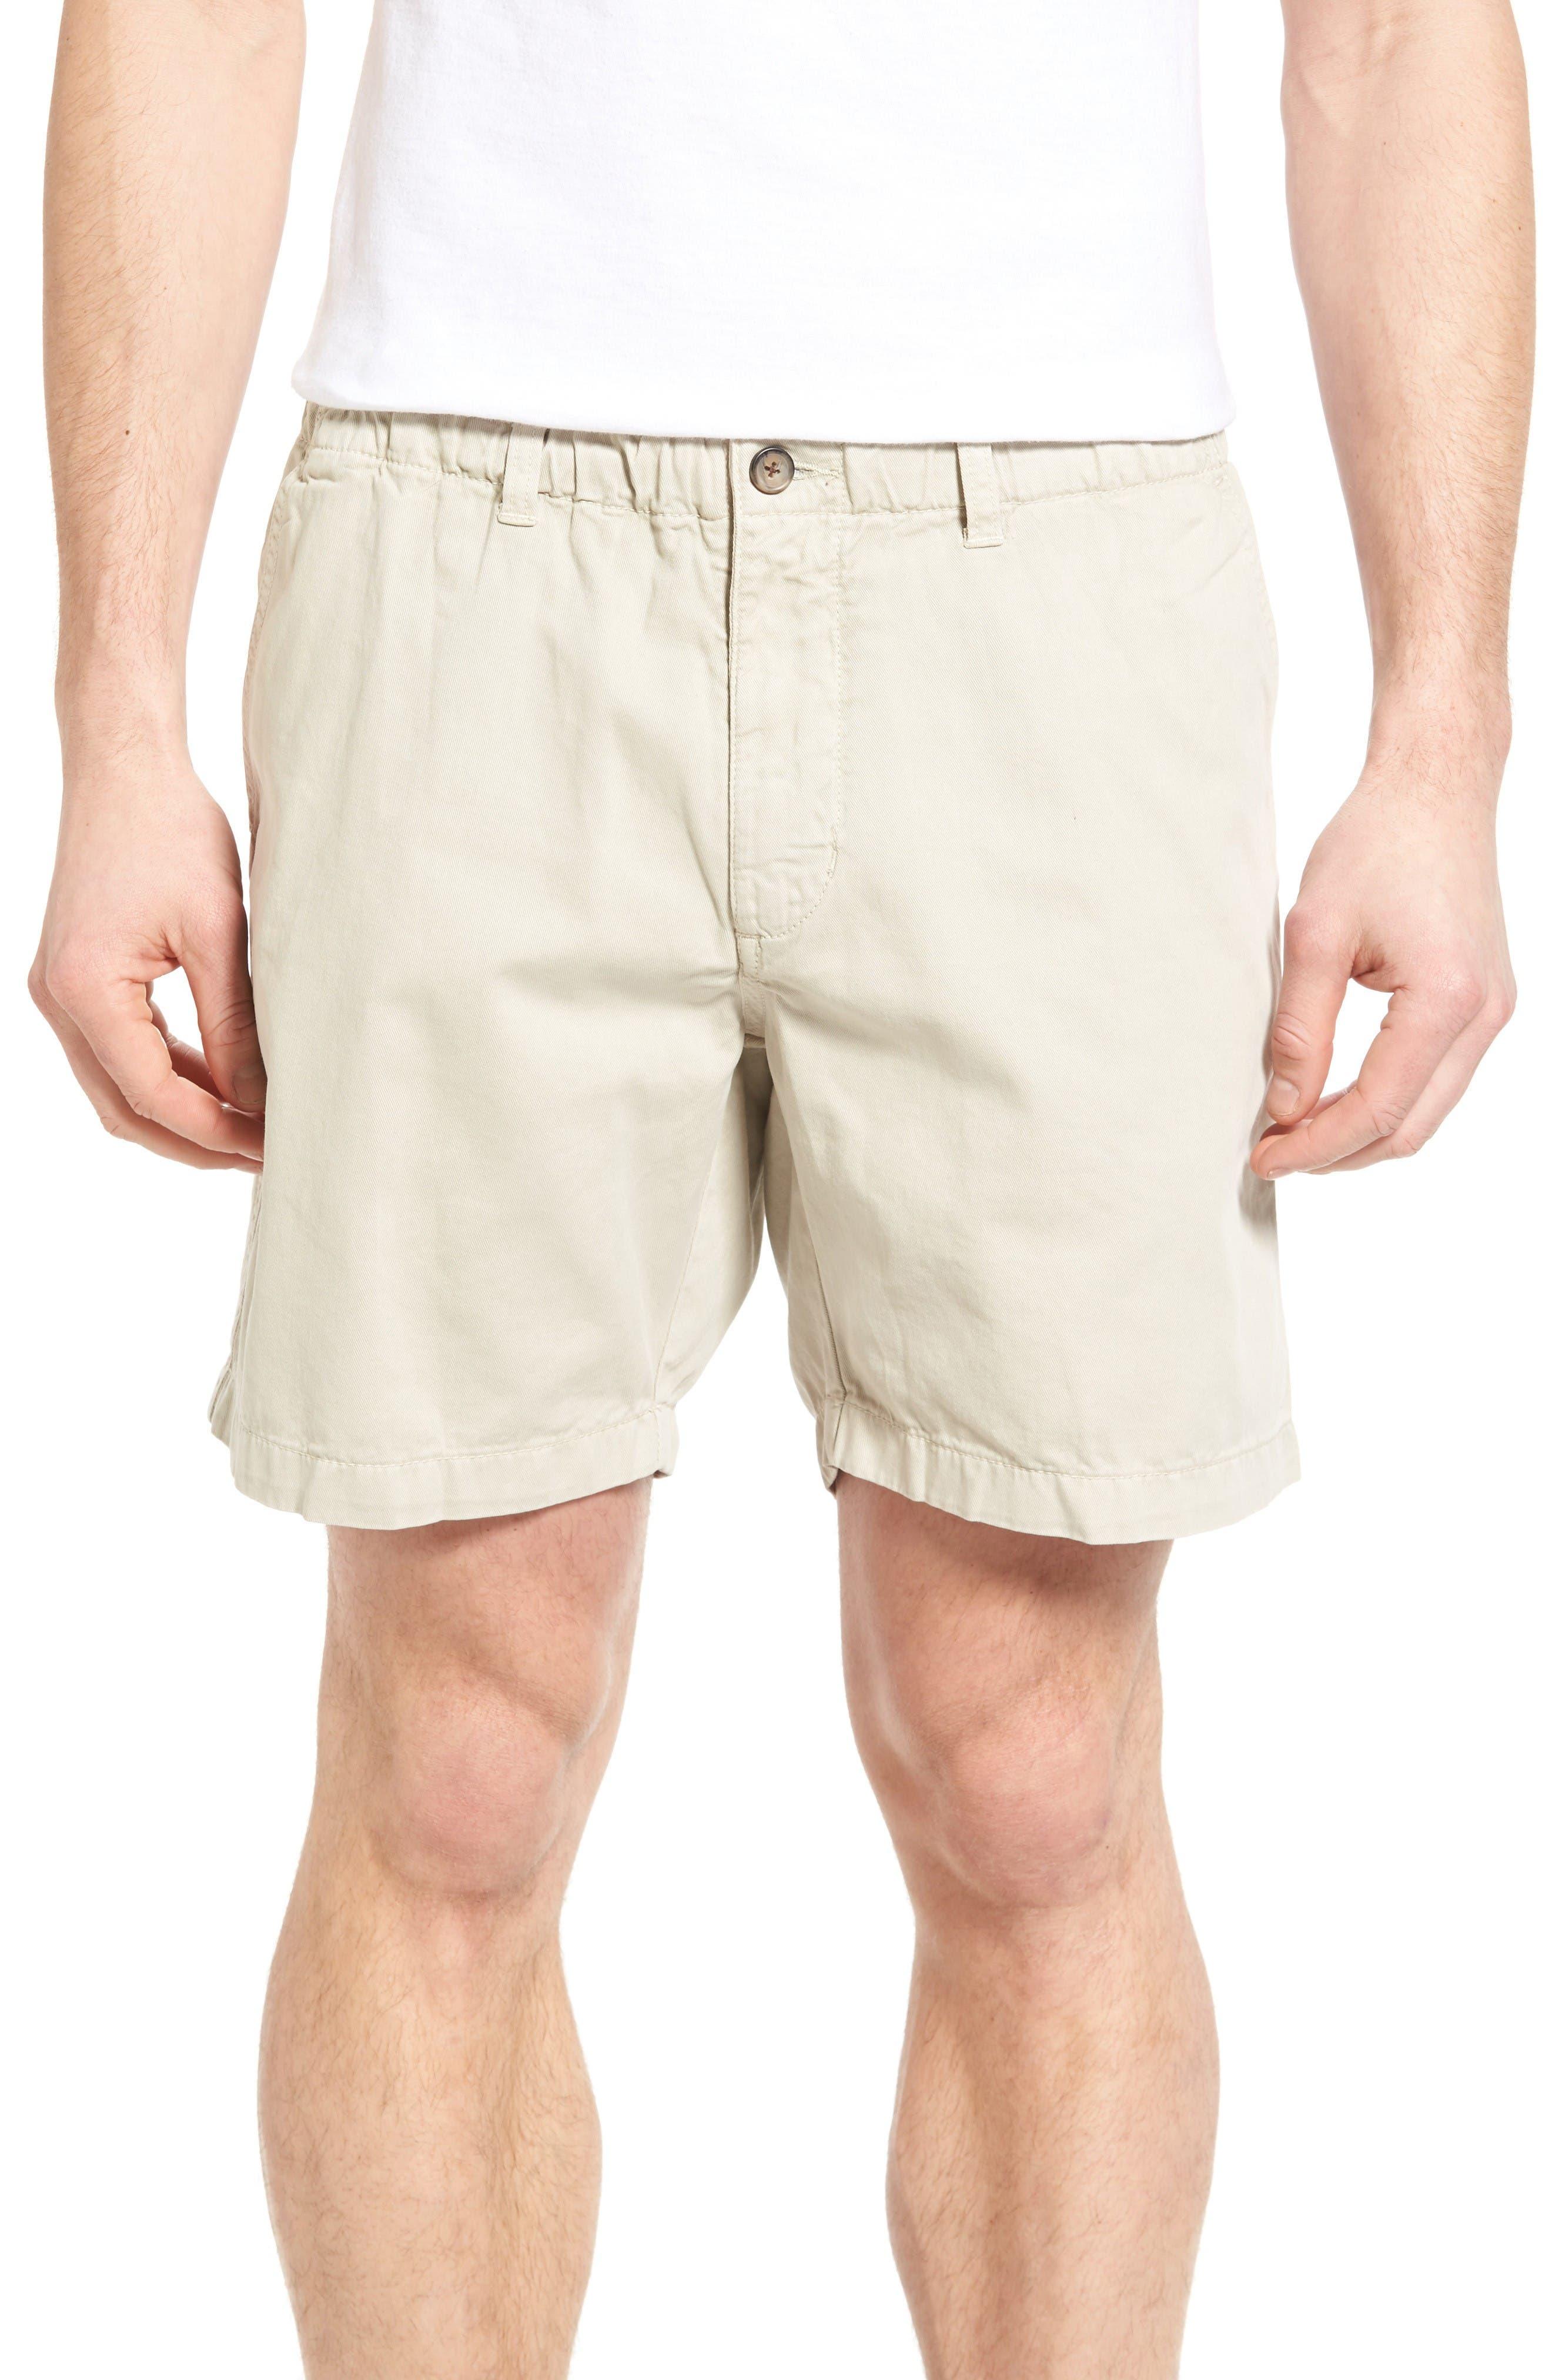 VINTAGE 1946 Washed Shorts